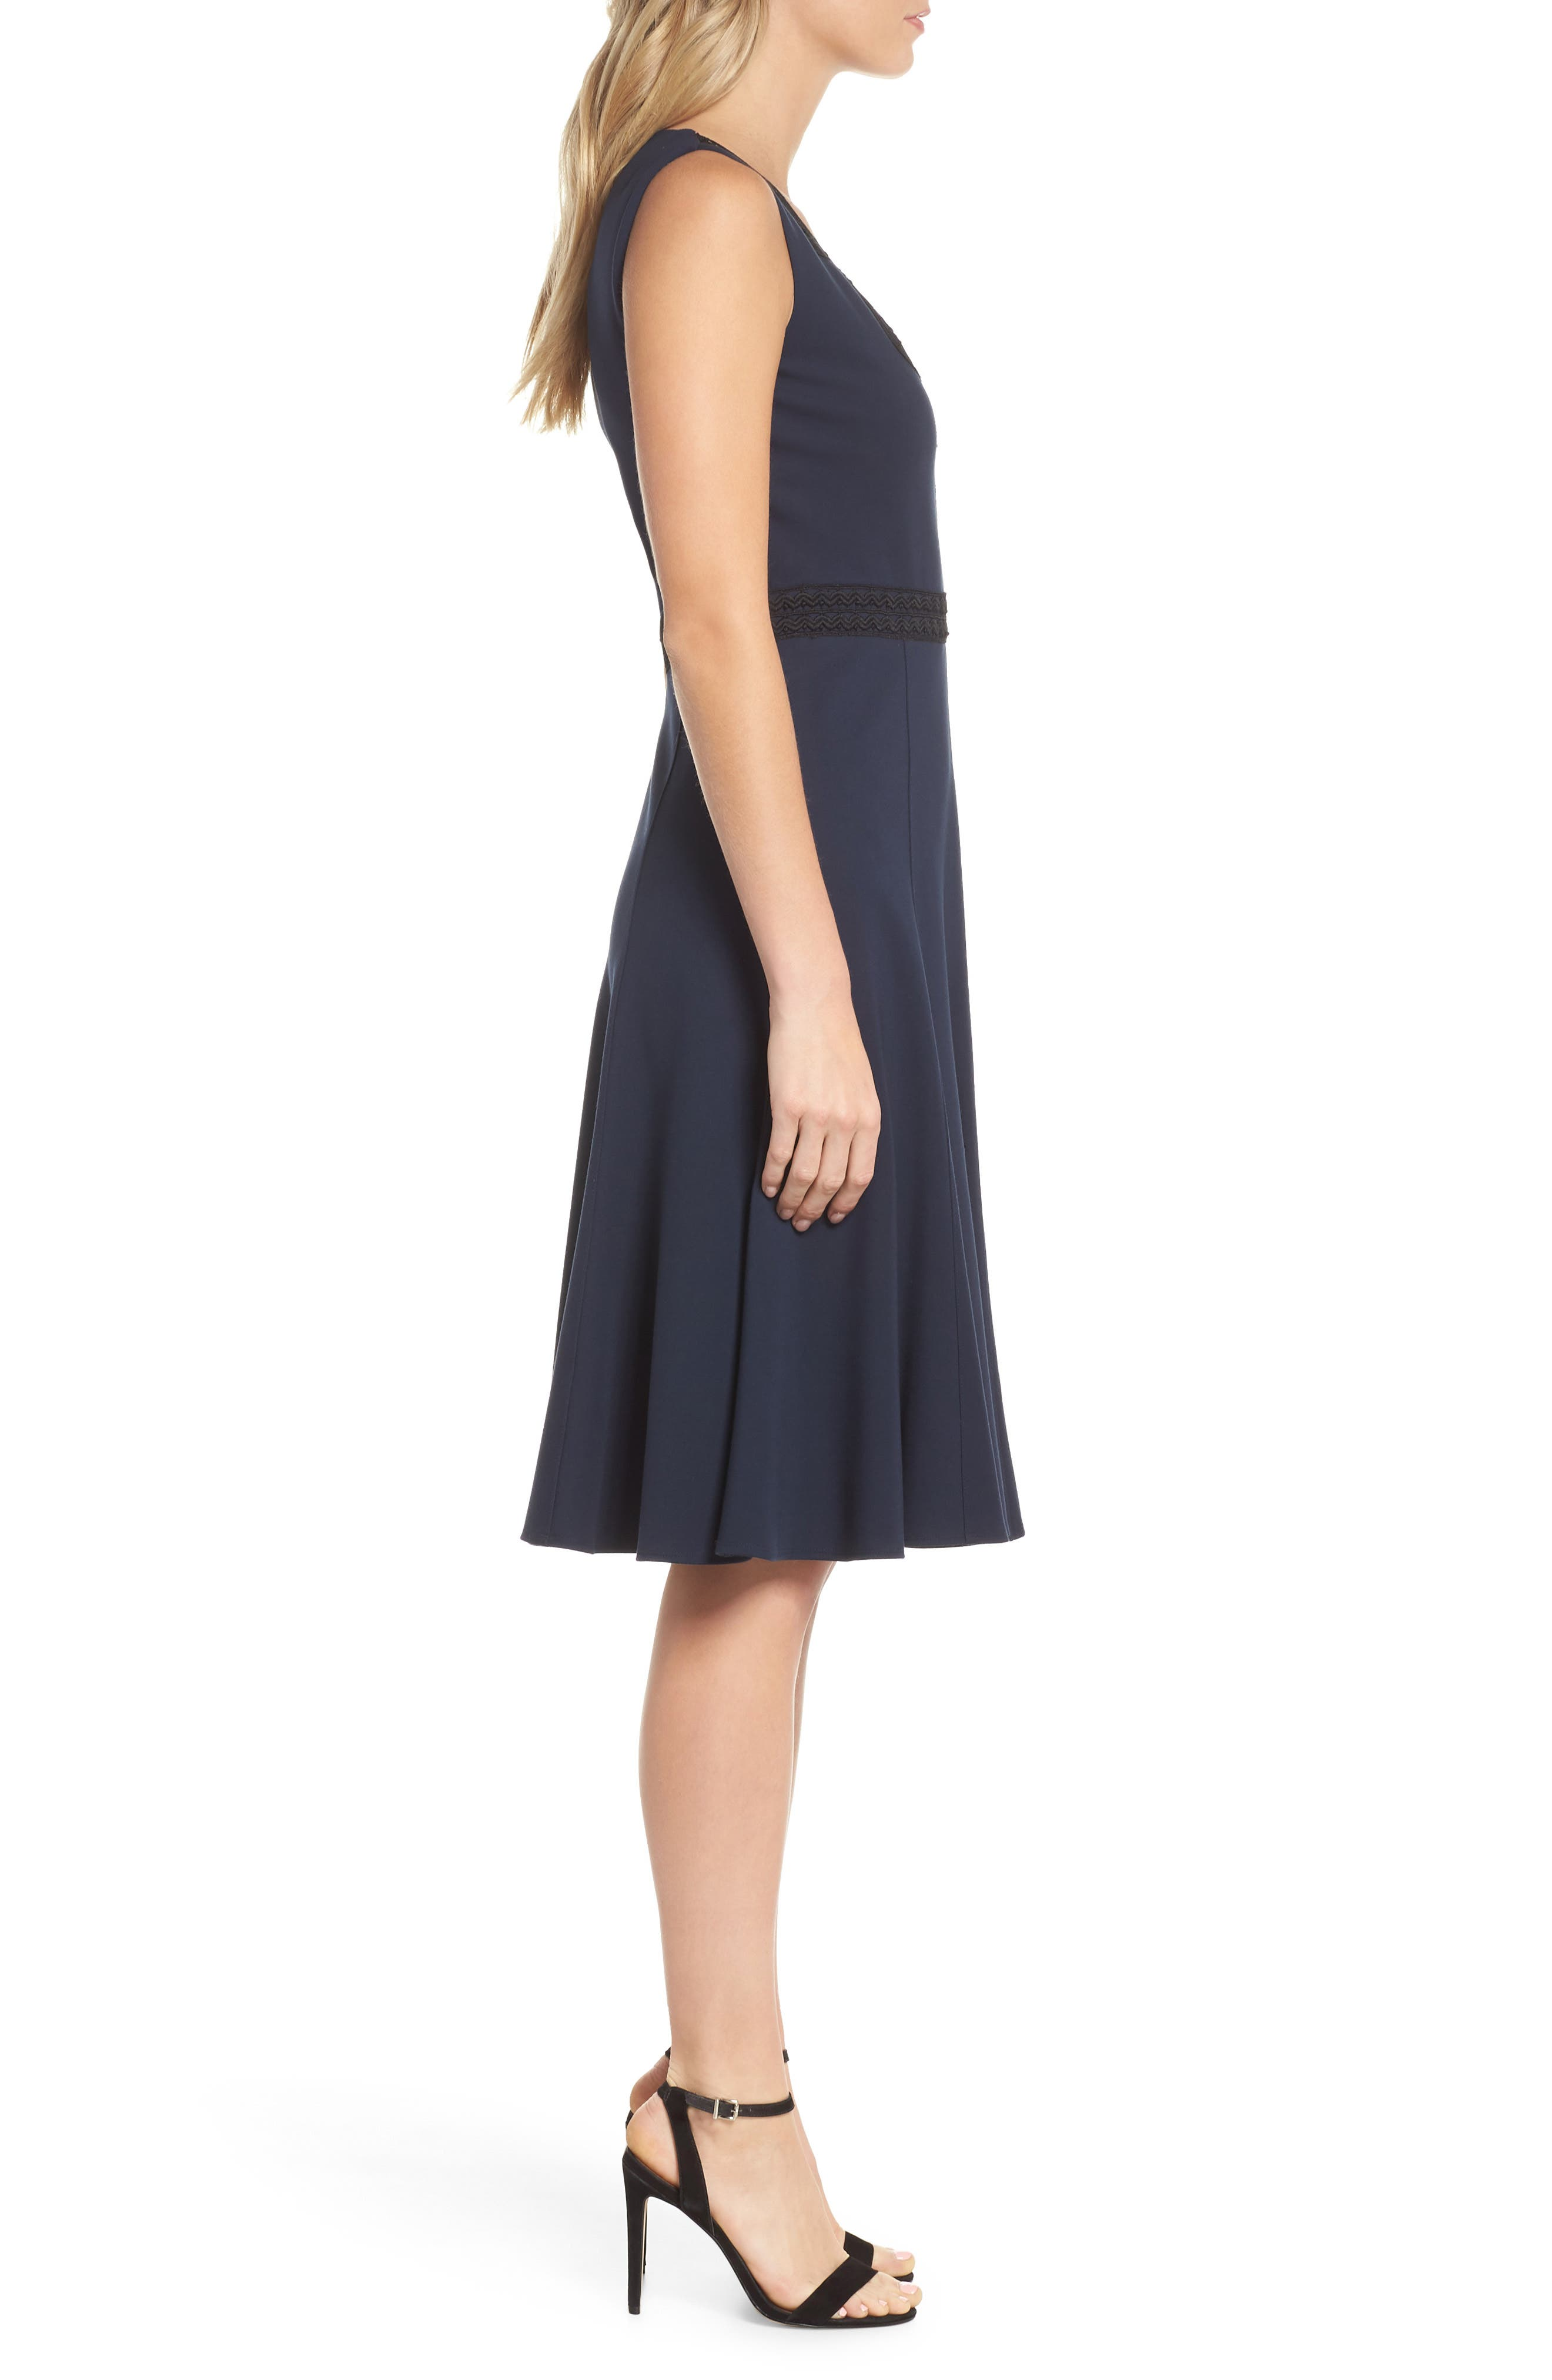 Hazel Lace Trim V-Neck Dress,                             Alternate thumbnail 3, color,                             Midnight Blue/ Black